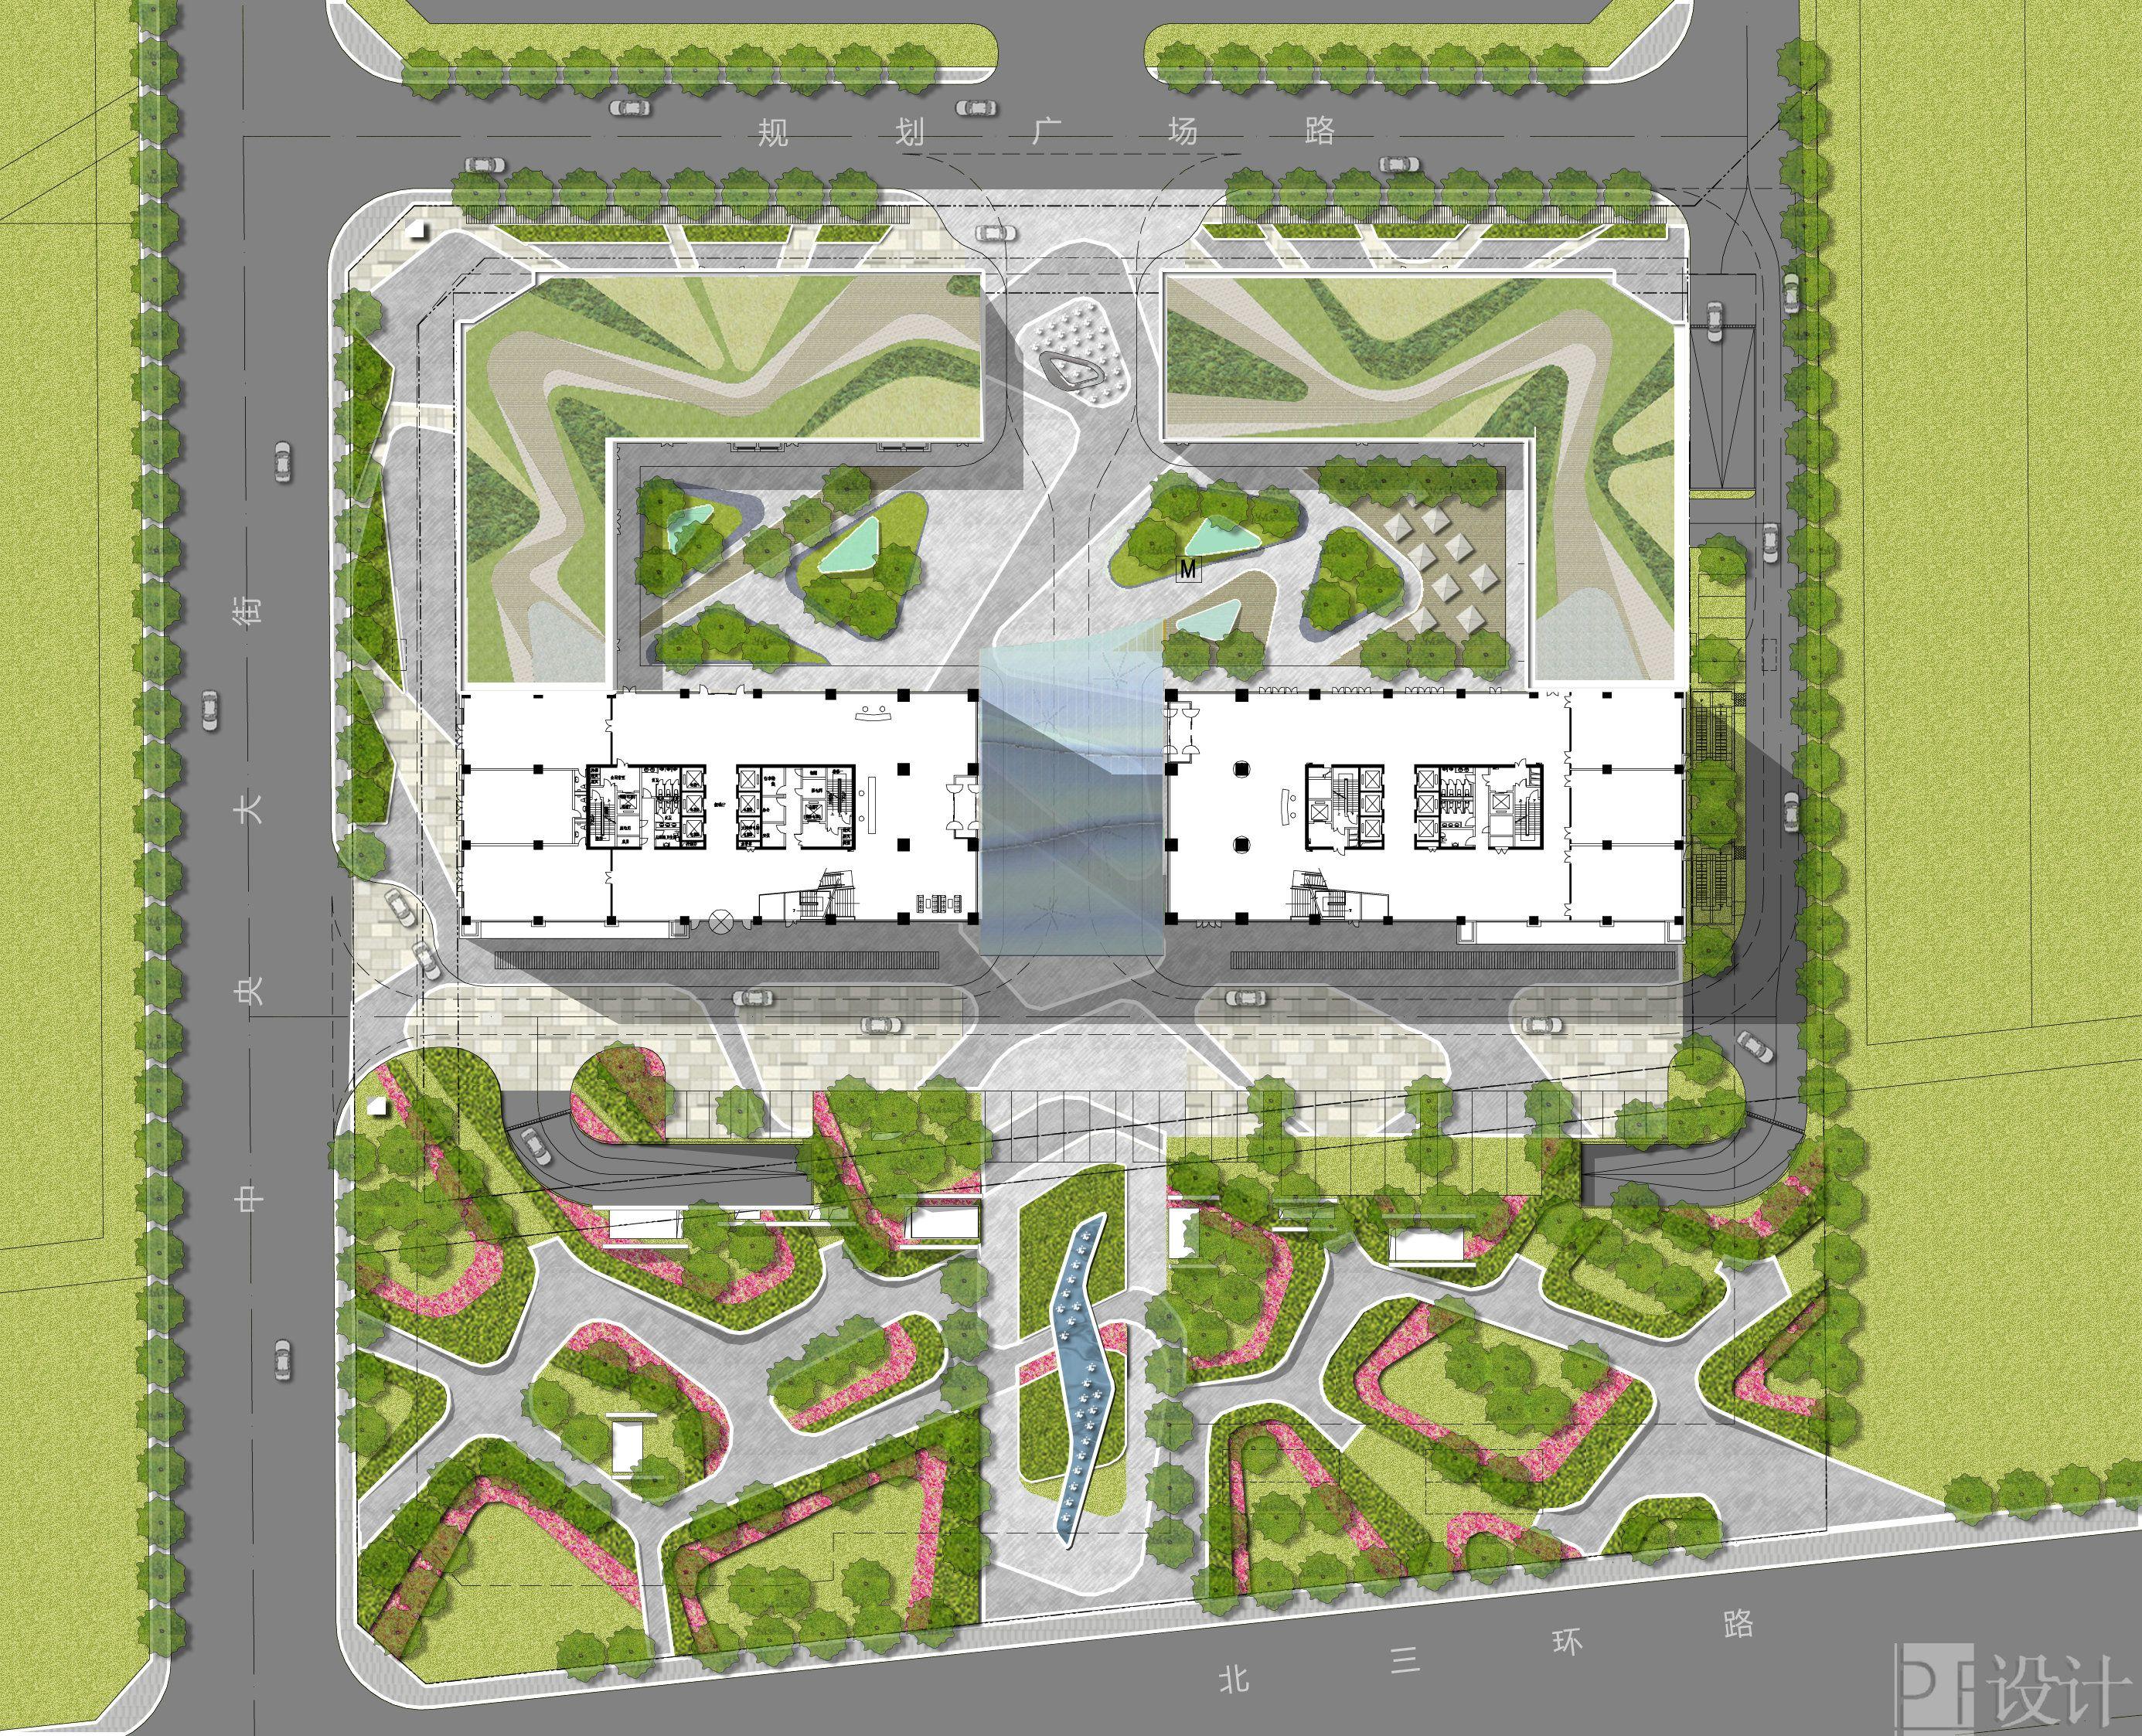 Best Collections Download Autocad Blocks Drawings Details 3d Psd Landscape Design Services Landscape Design Plans Landscape Design